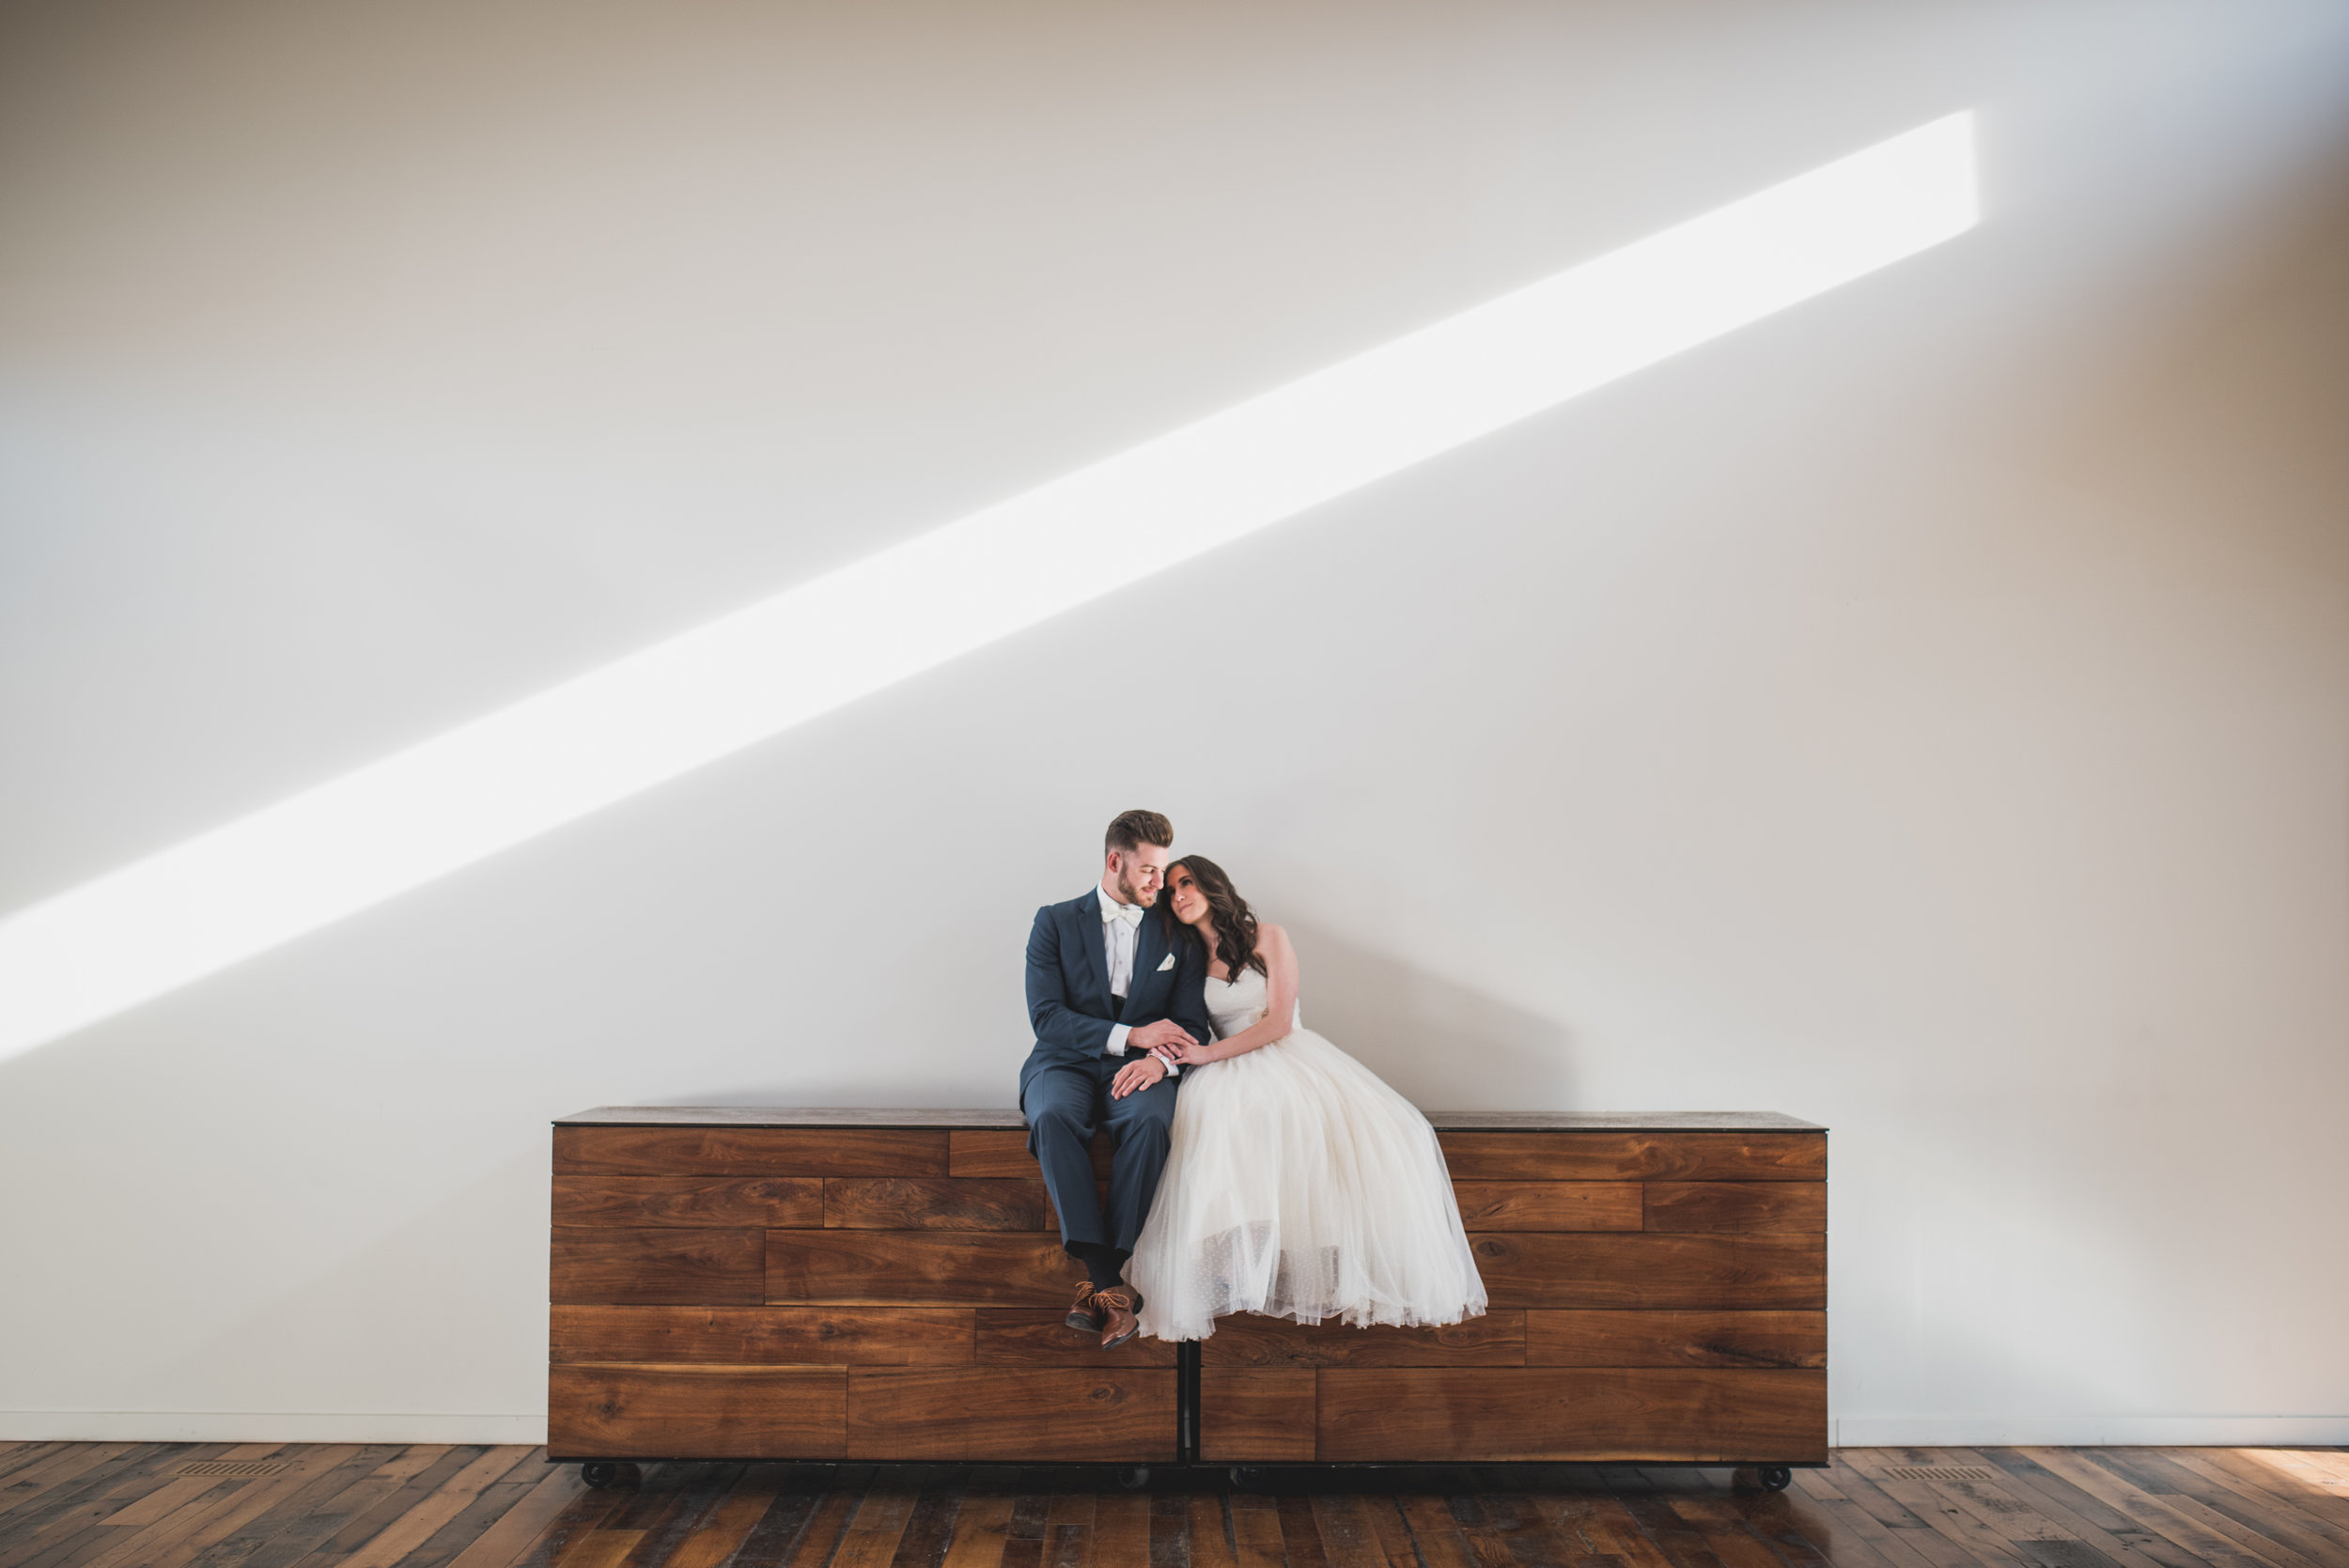 Nashville-Wedding-Photographer-Favorites39.jpg